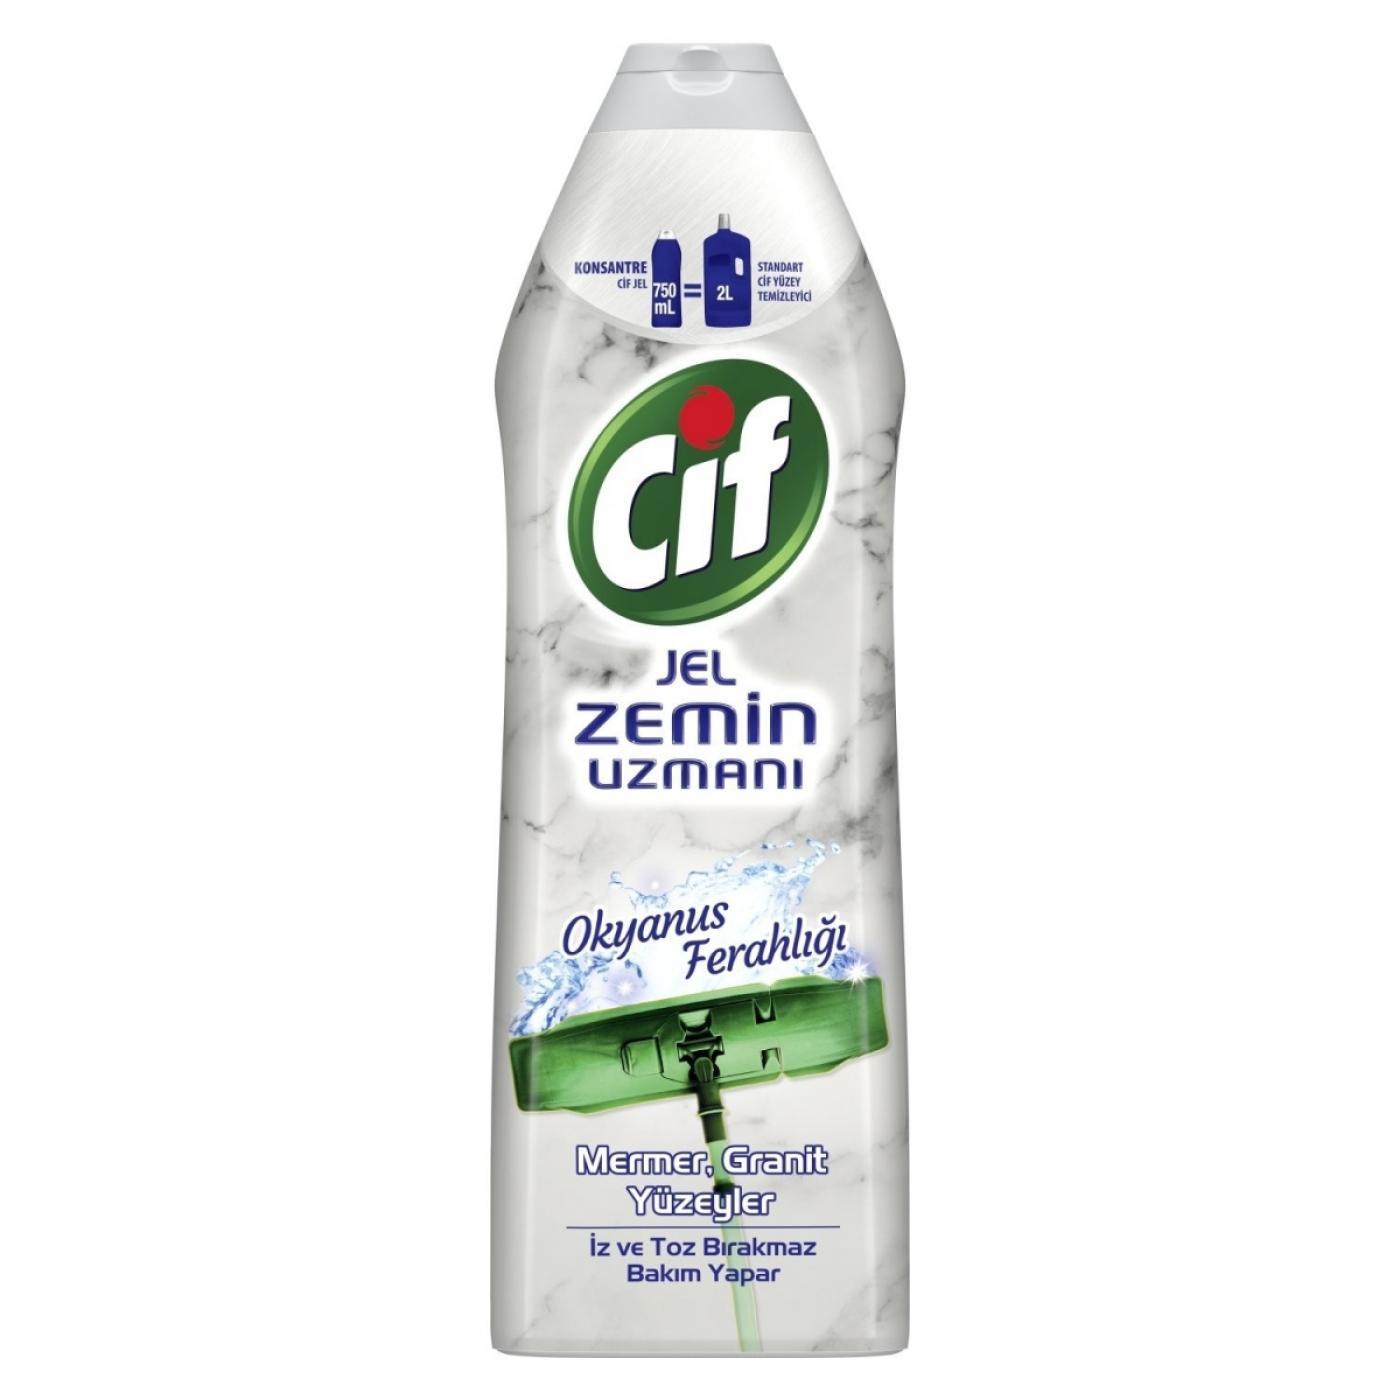 CİF JEL ZEMİN UZMANI 750ML MERMER& GRANIT